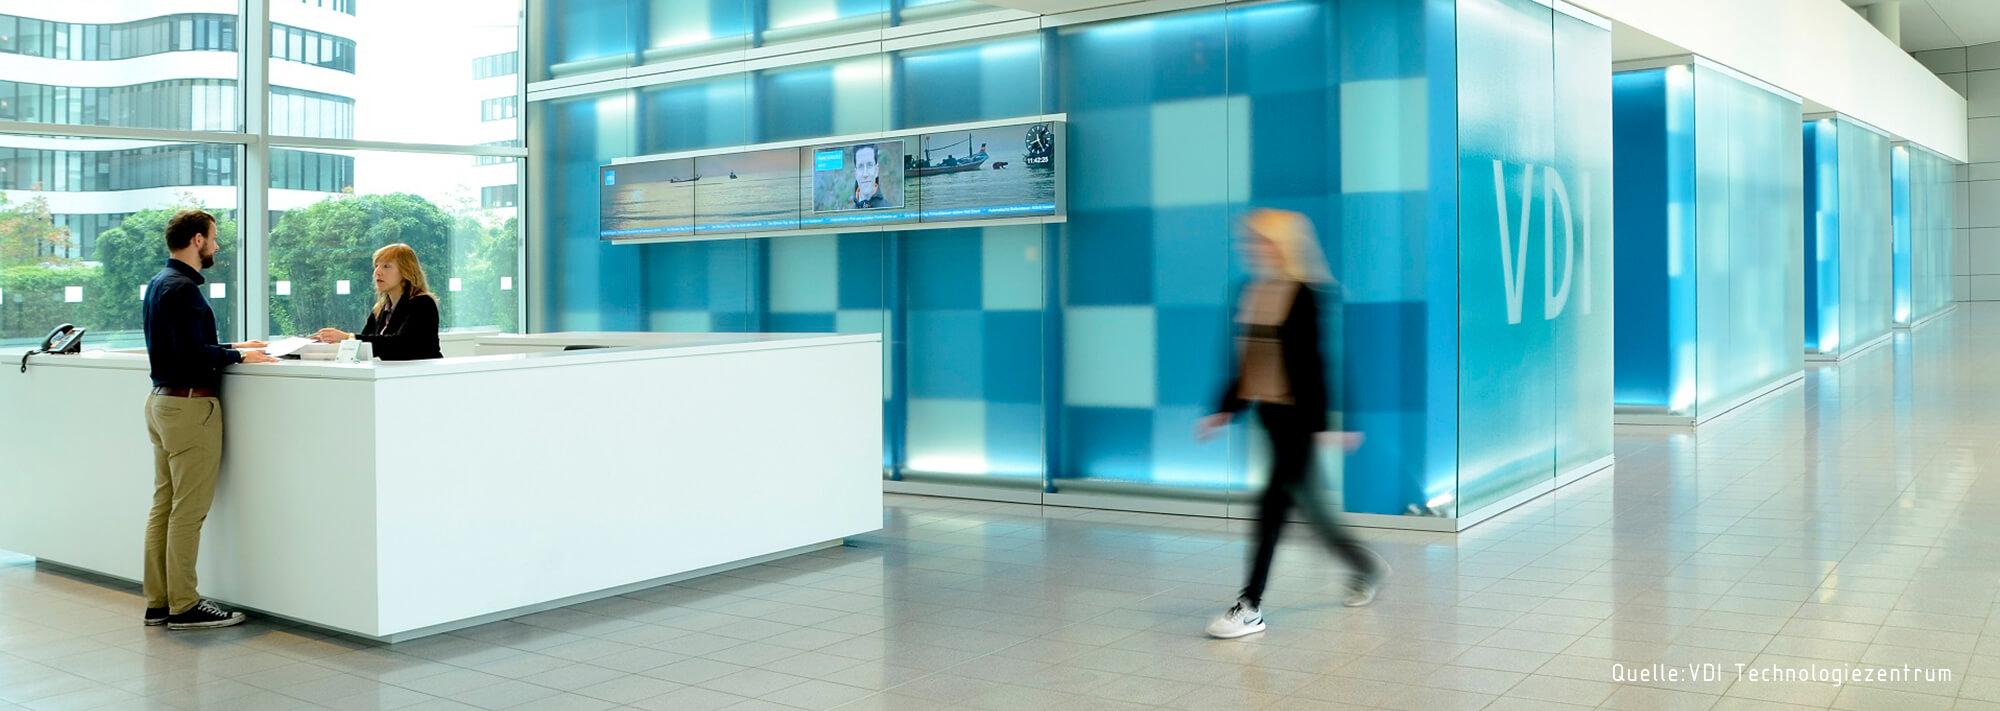 VDI Technologiezentrum Innovation Update Berlin Düsseldorf Fotos